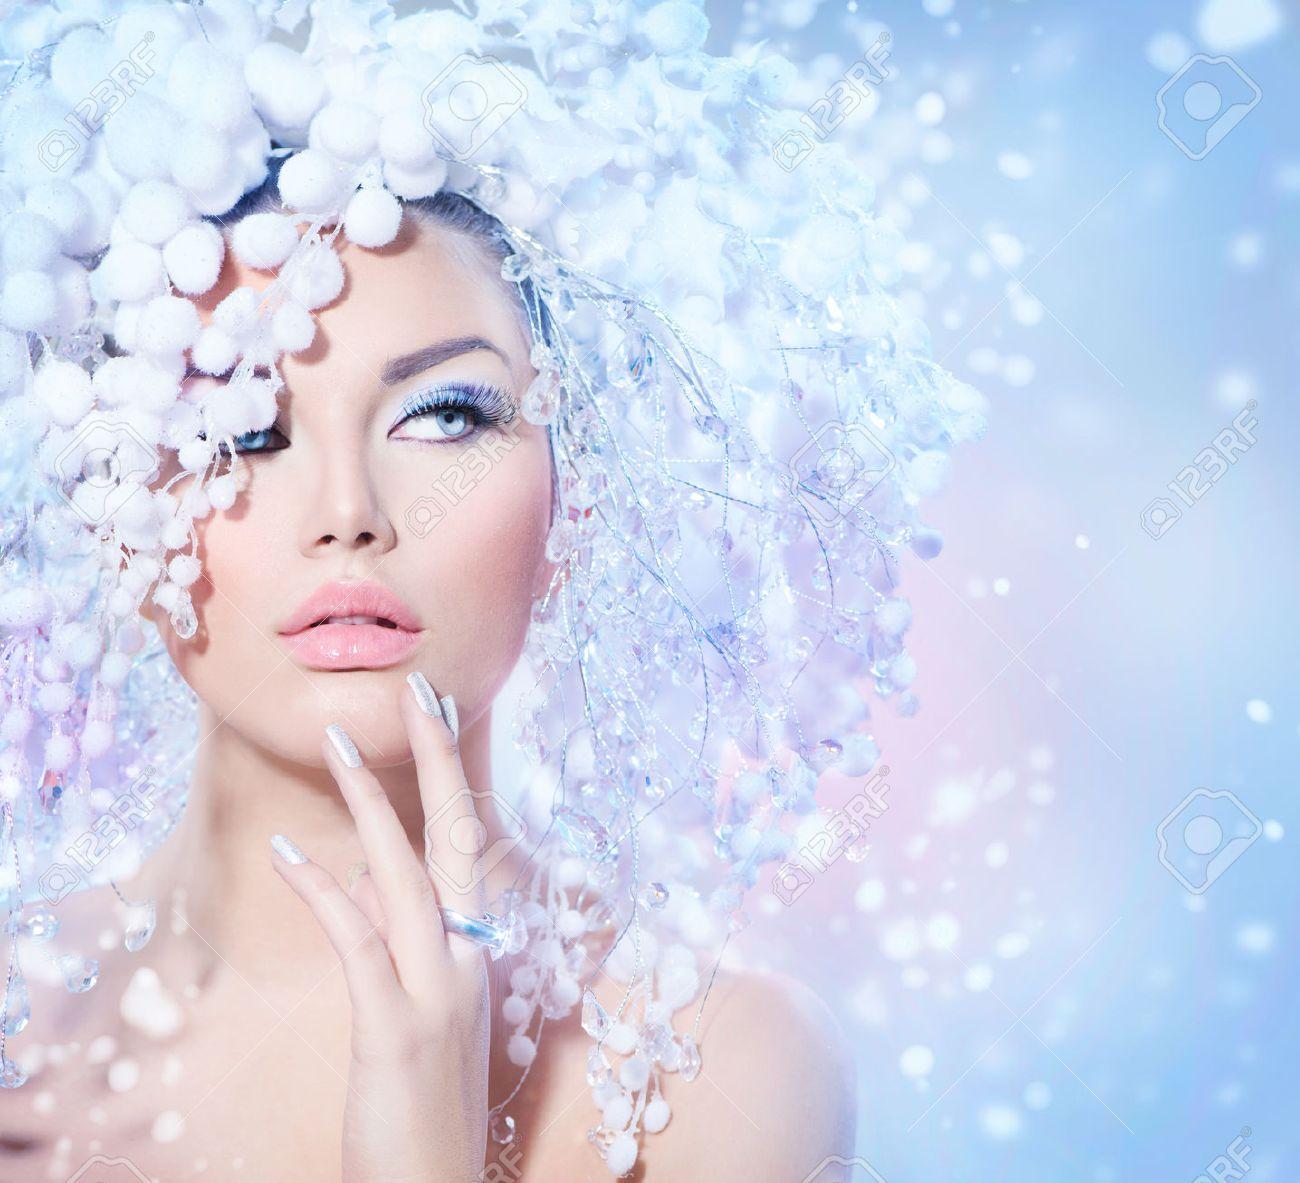 Winter Beauty Woman  Christmas Girl Makeup Stock Photo - 24331811